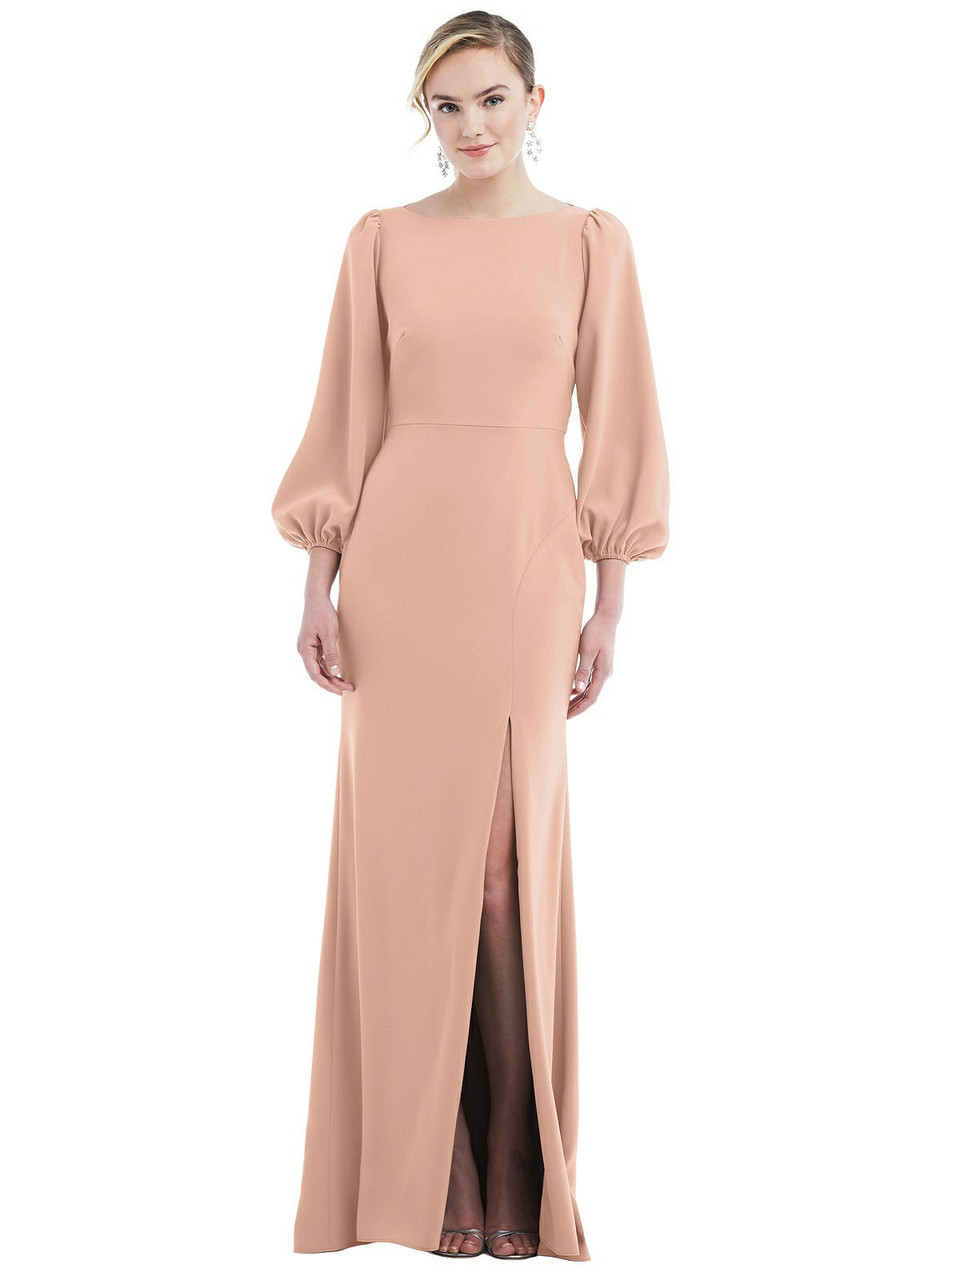 Dessy Bridesmaid Dress 3086 - Crepe